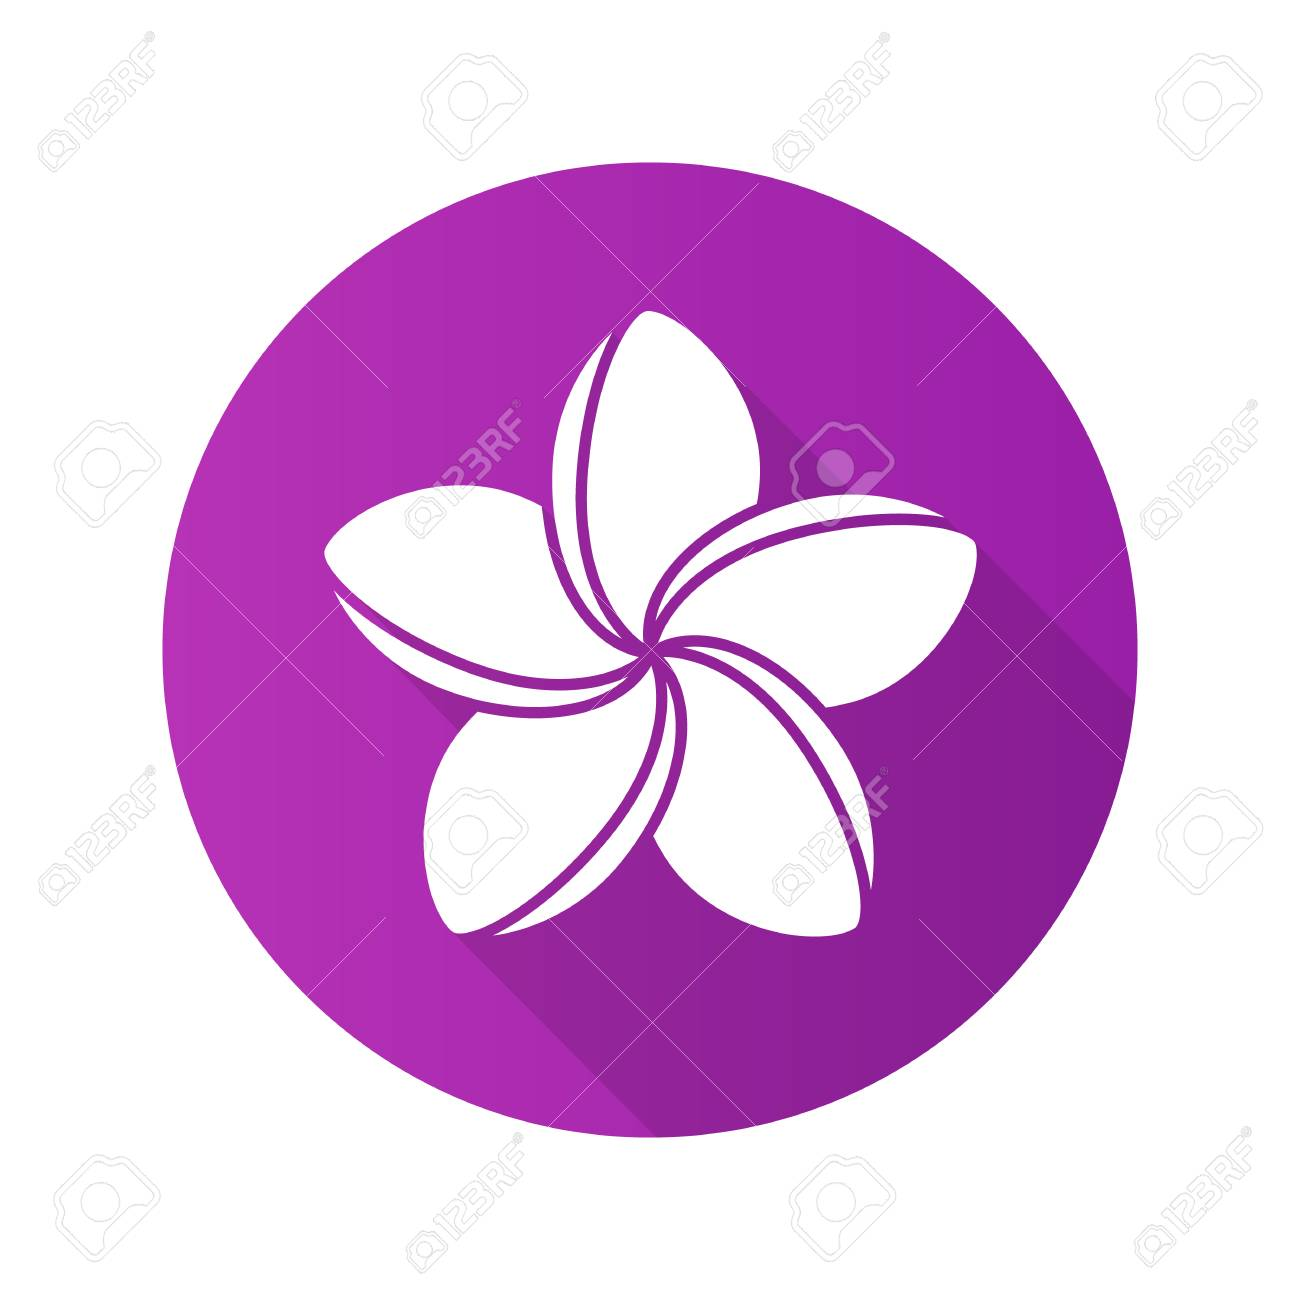 Spa salon plumeria flower. Flat design long shadow icon. Aromatherapy. Vector silhouette symbol - 77758425